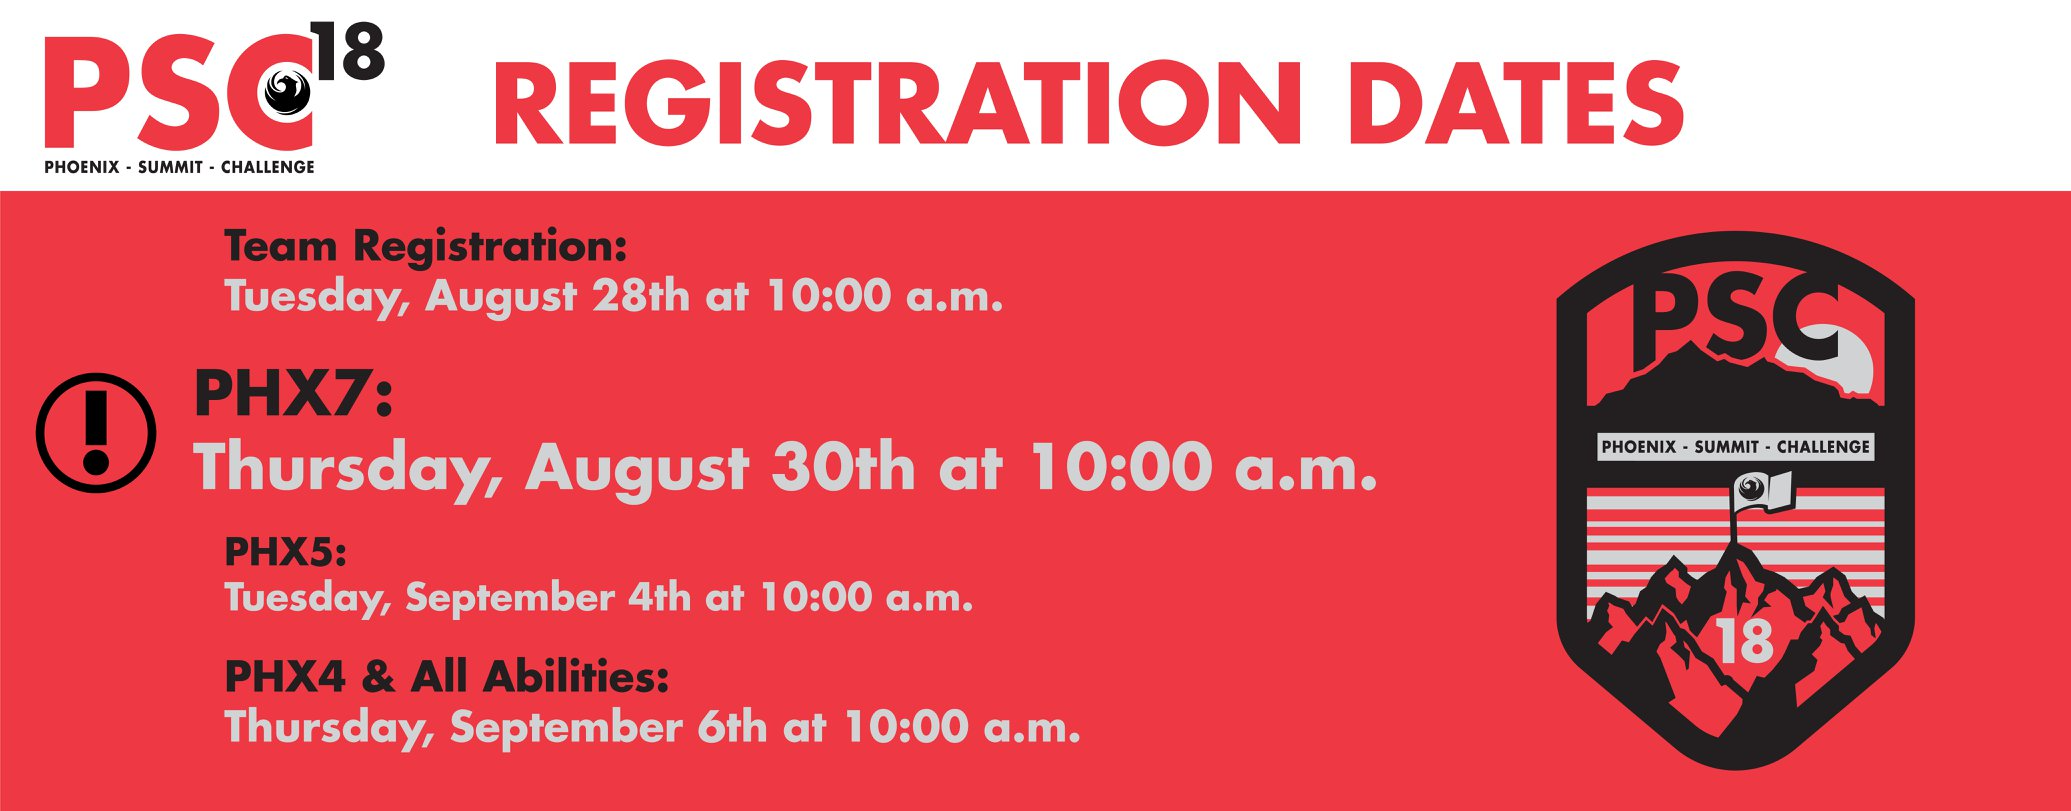 Officials Announce Important Registration Dates for Phoenix Summit